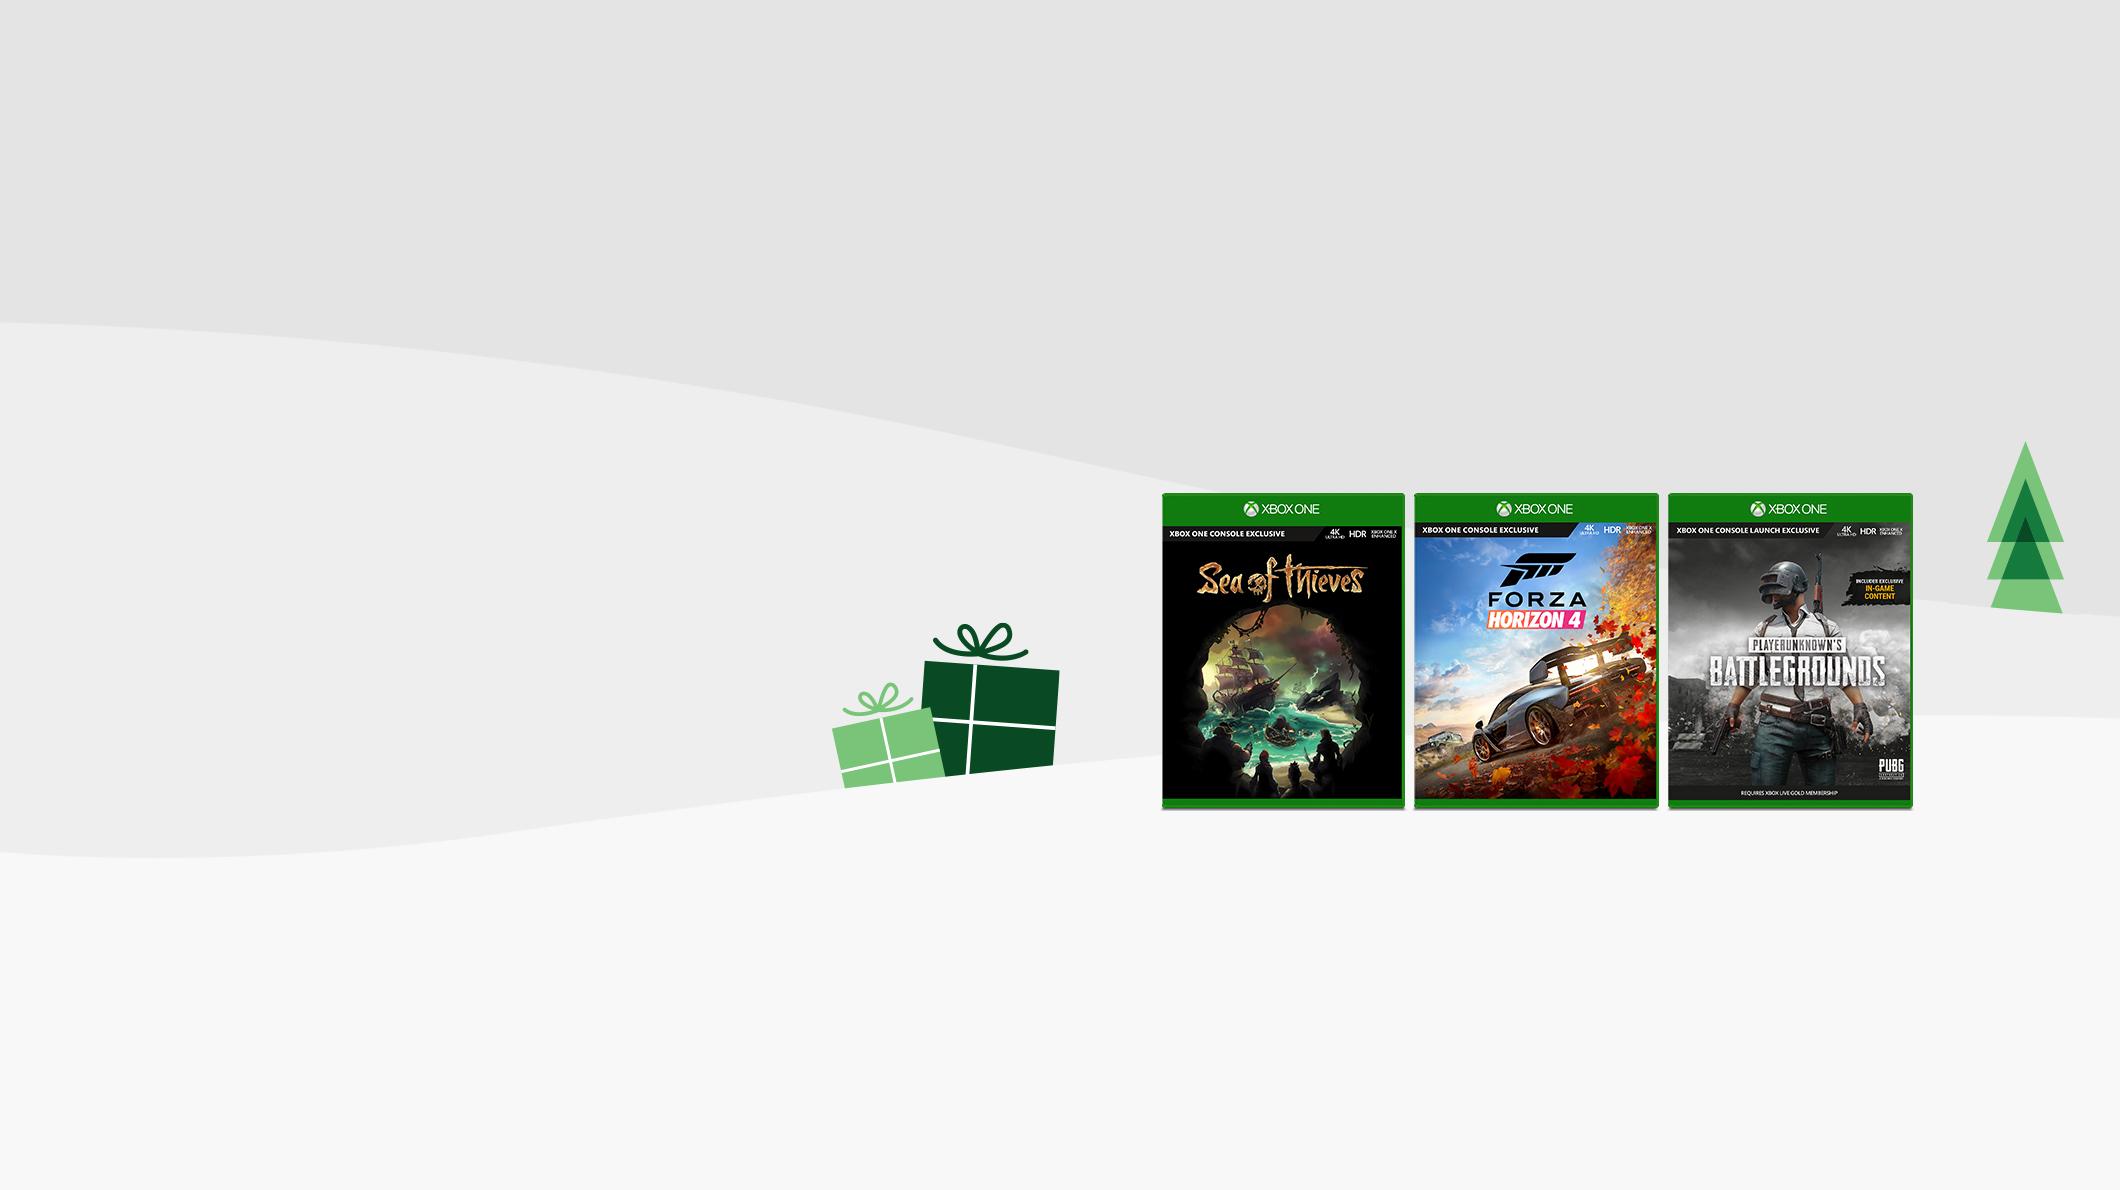 Sea of Thieves, Forza Horizon 4, Playerunknown Battlegrounds